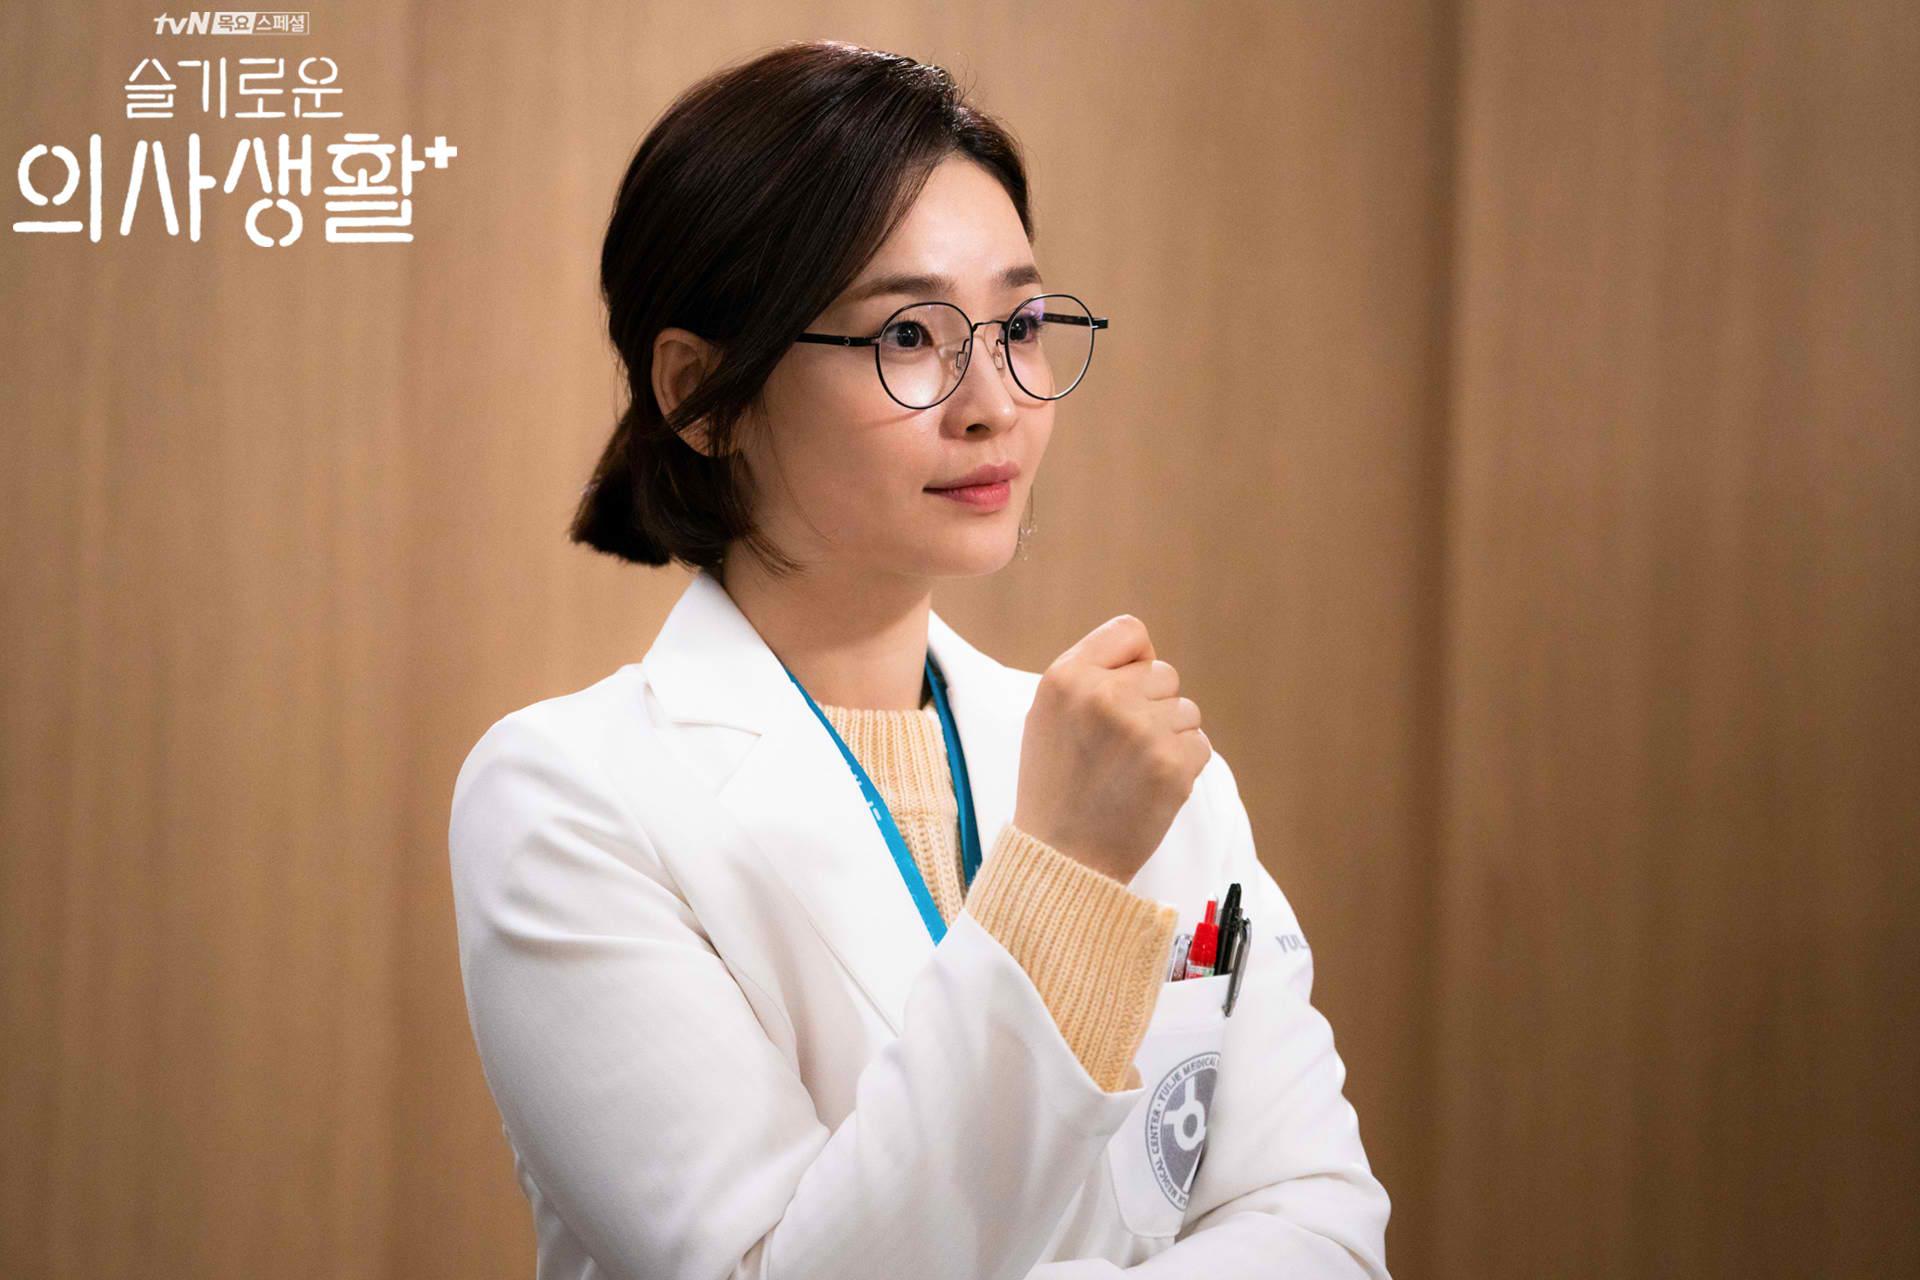 2.2 Hospital Playlist Jeon Mido